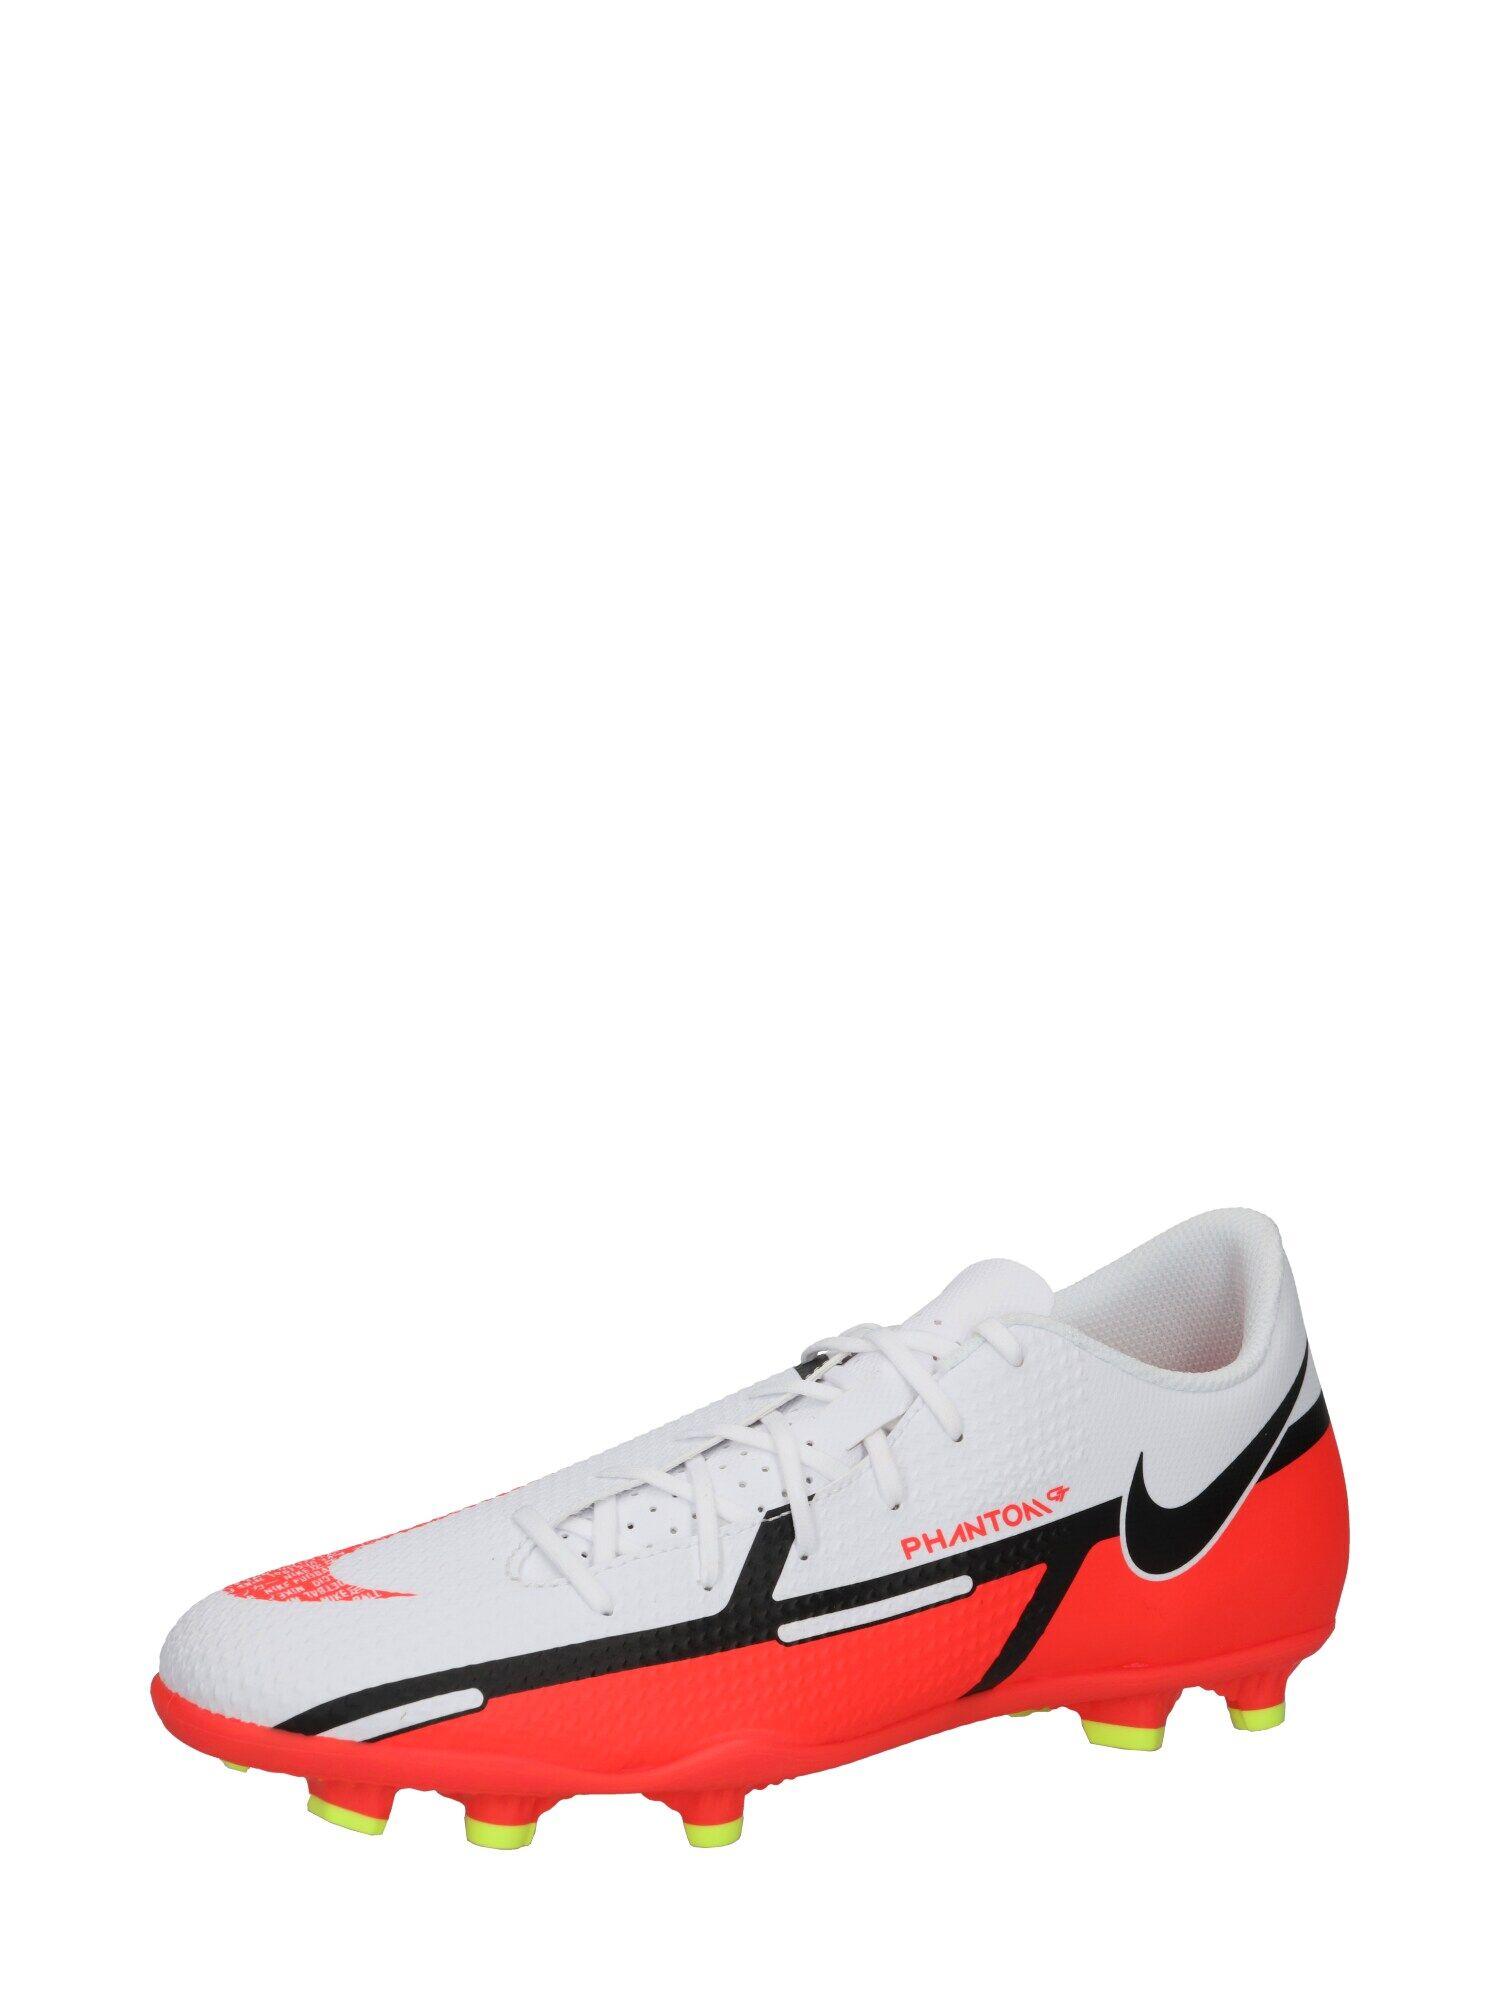 nike scarpa da calcio 'phantom' bianco